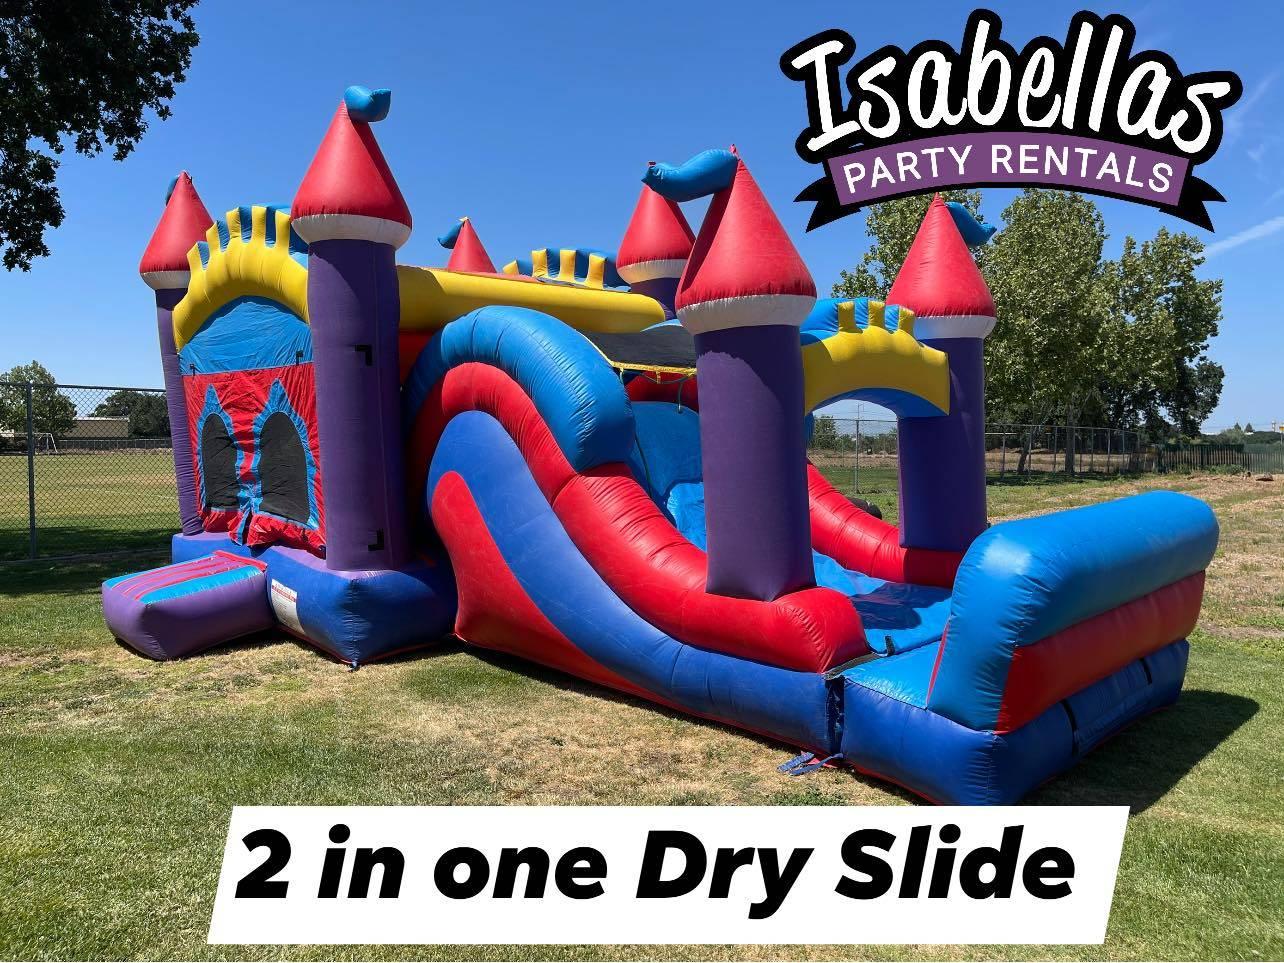 2 in one Dry slide